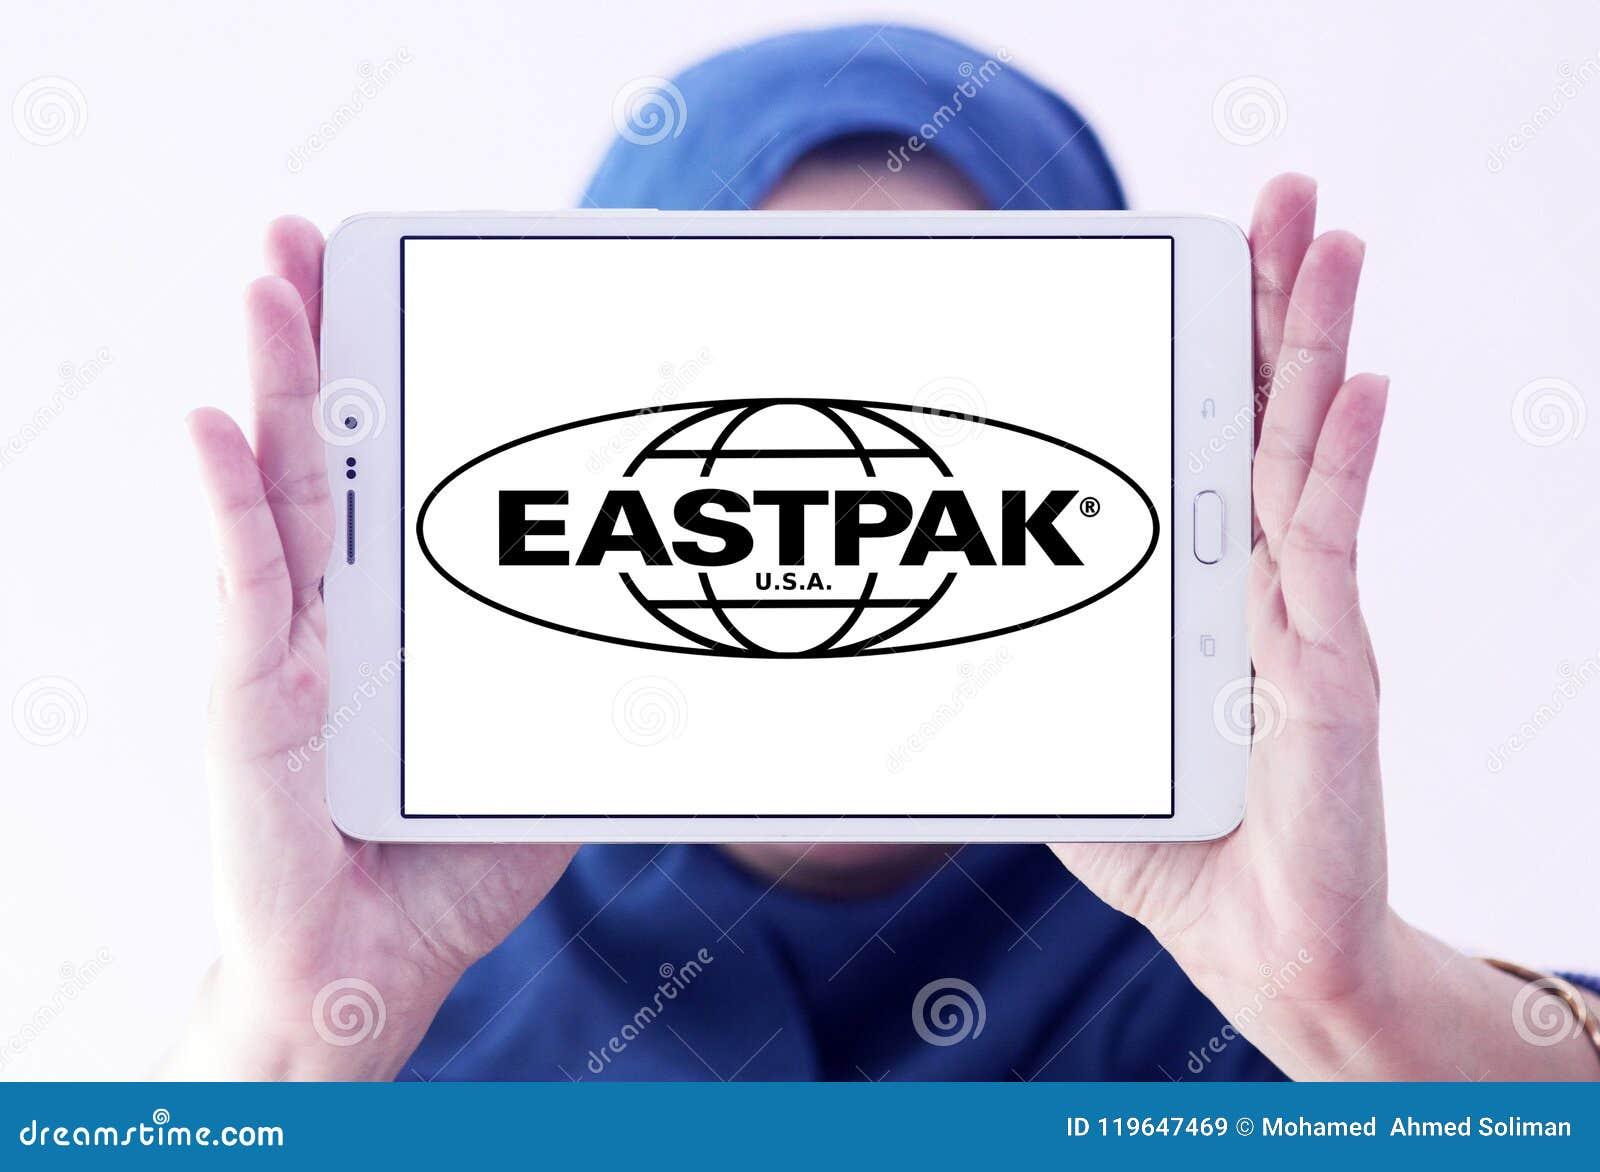 Eastpak company logo editorial stock image  Image of apparel - 119647469